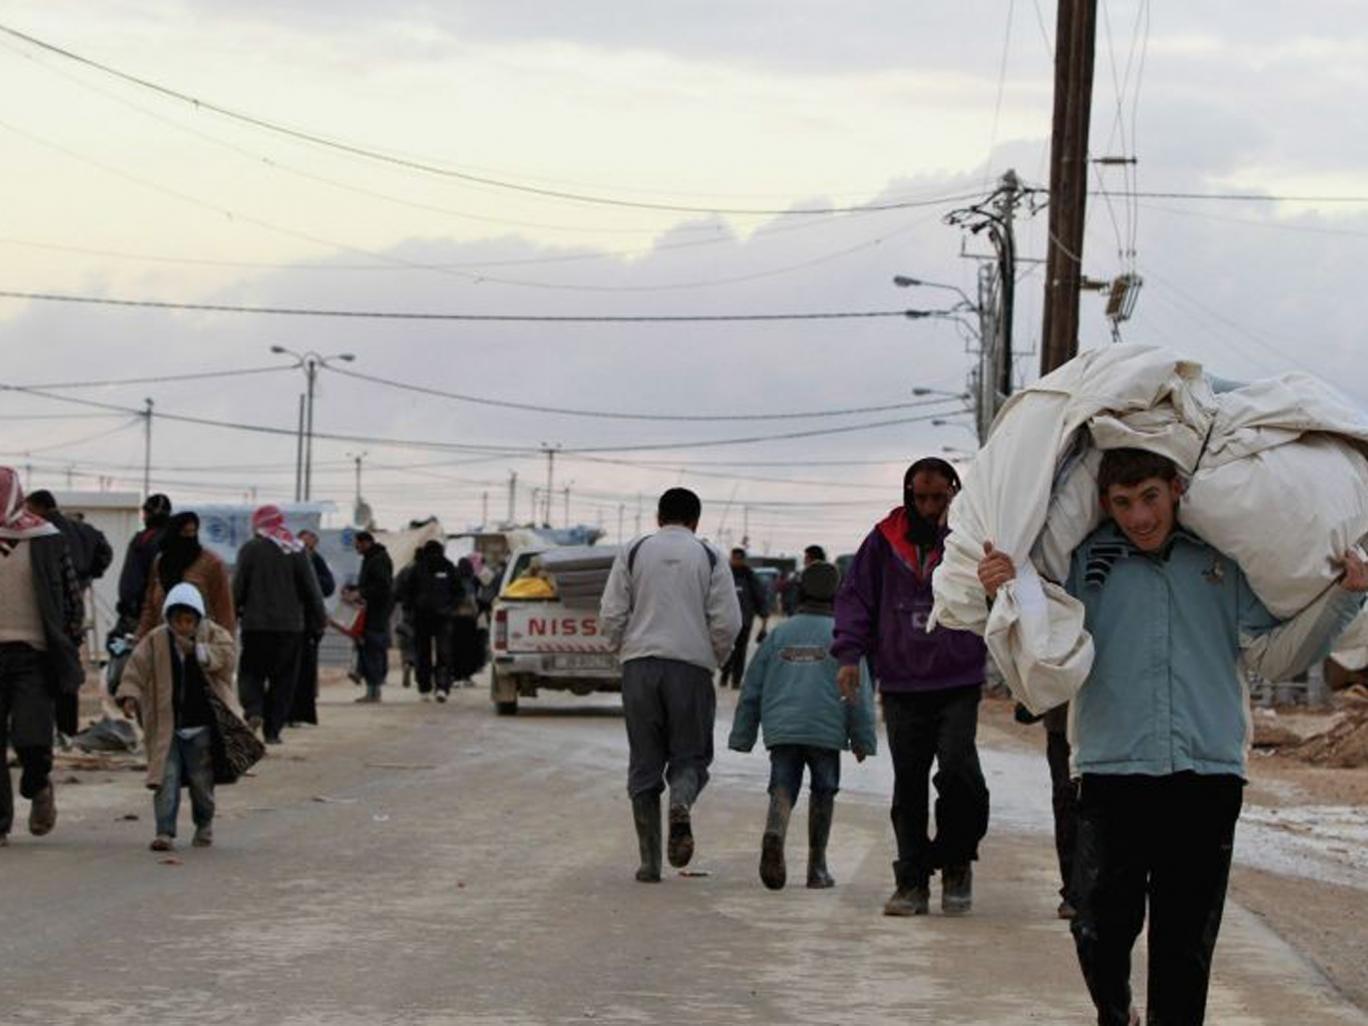 Syrian refugees at the Al-Zaatari camp in the Jordanian city of Mafraq